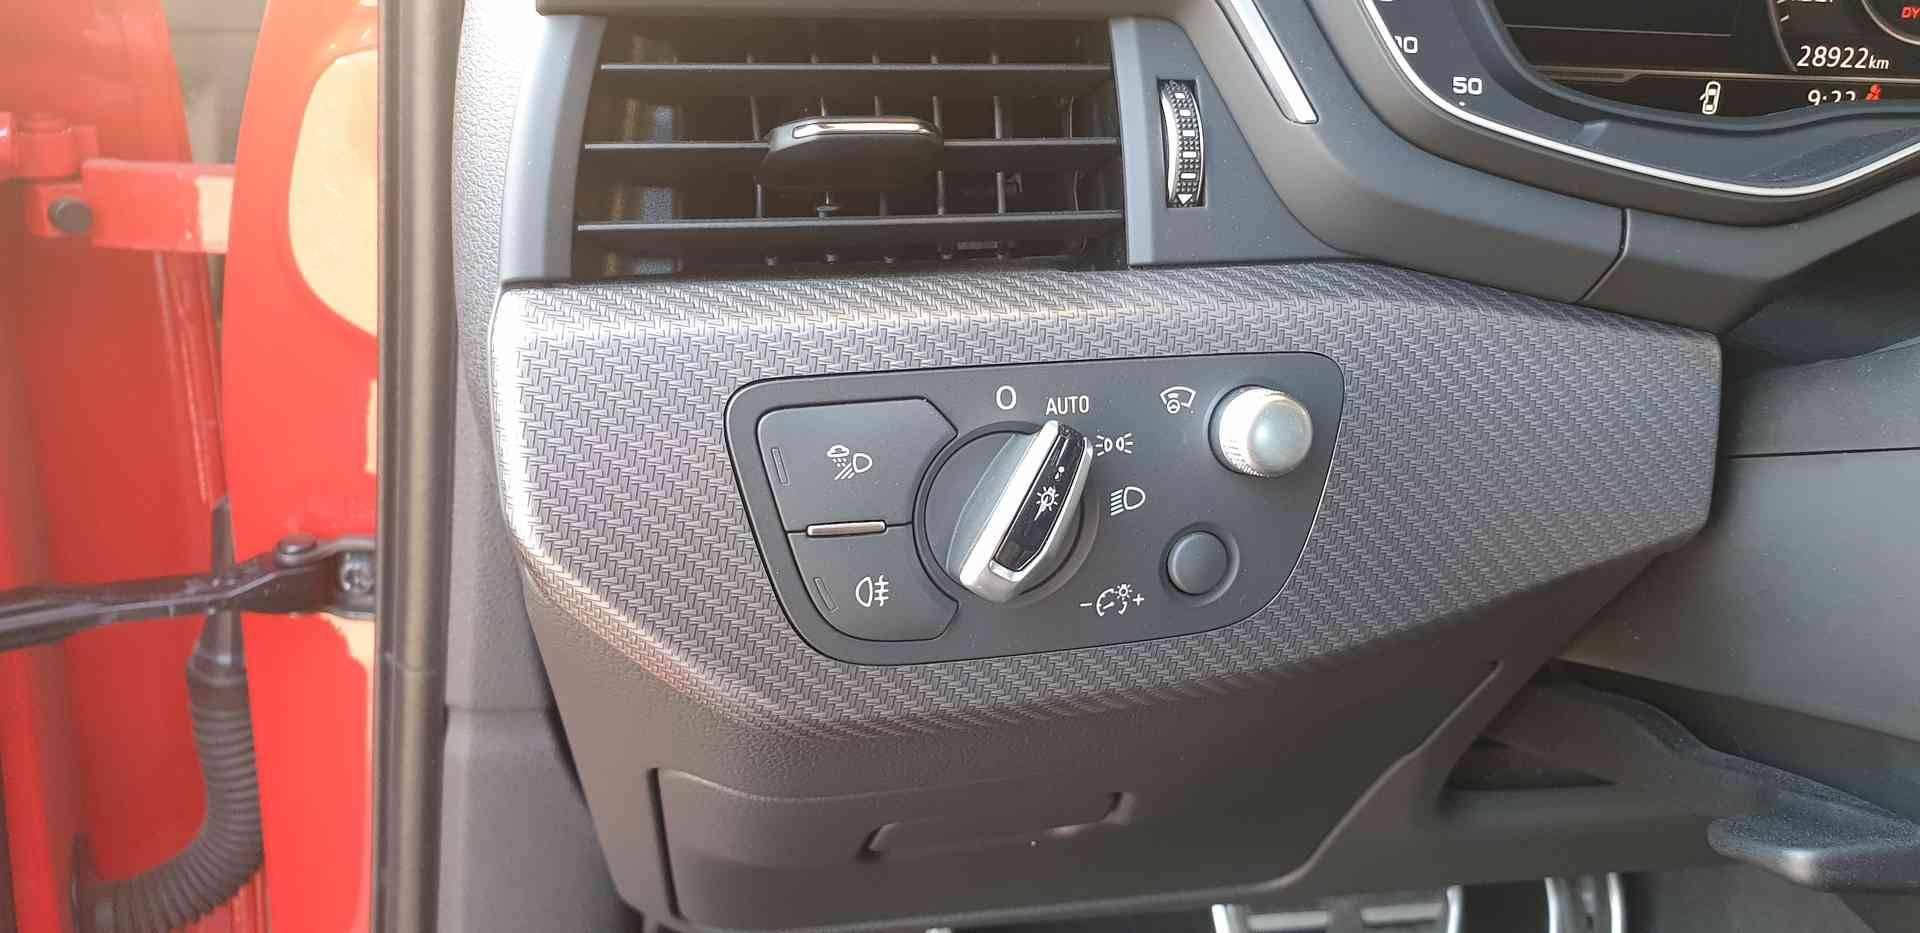 10 - RS4 Avant V6 2.9 TFSI 450 ch Tiptronic 8